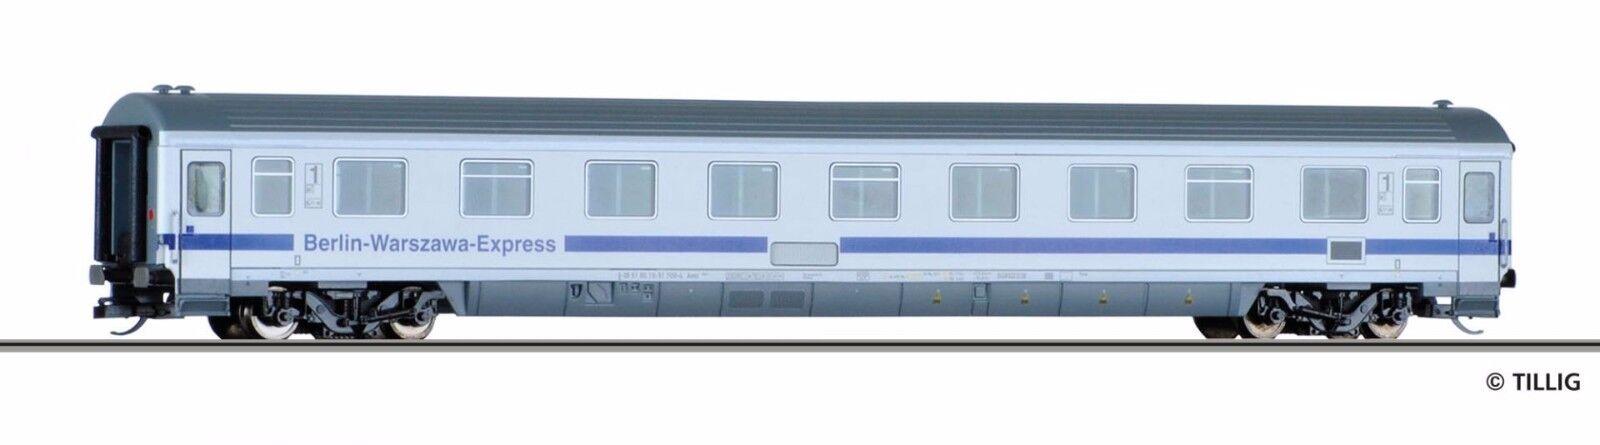 TT viaggiatori 1.kl. Avmz Berlino-warzawa-EXPRESS DB AG Ep. V Tillig 13544